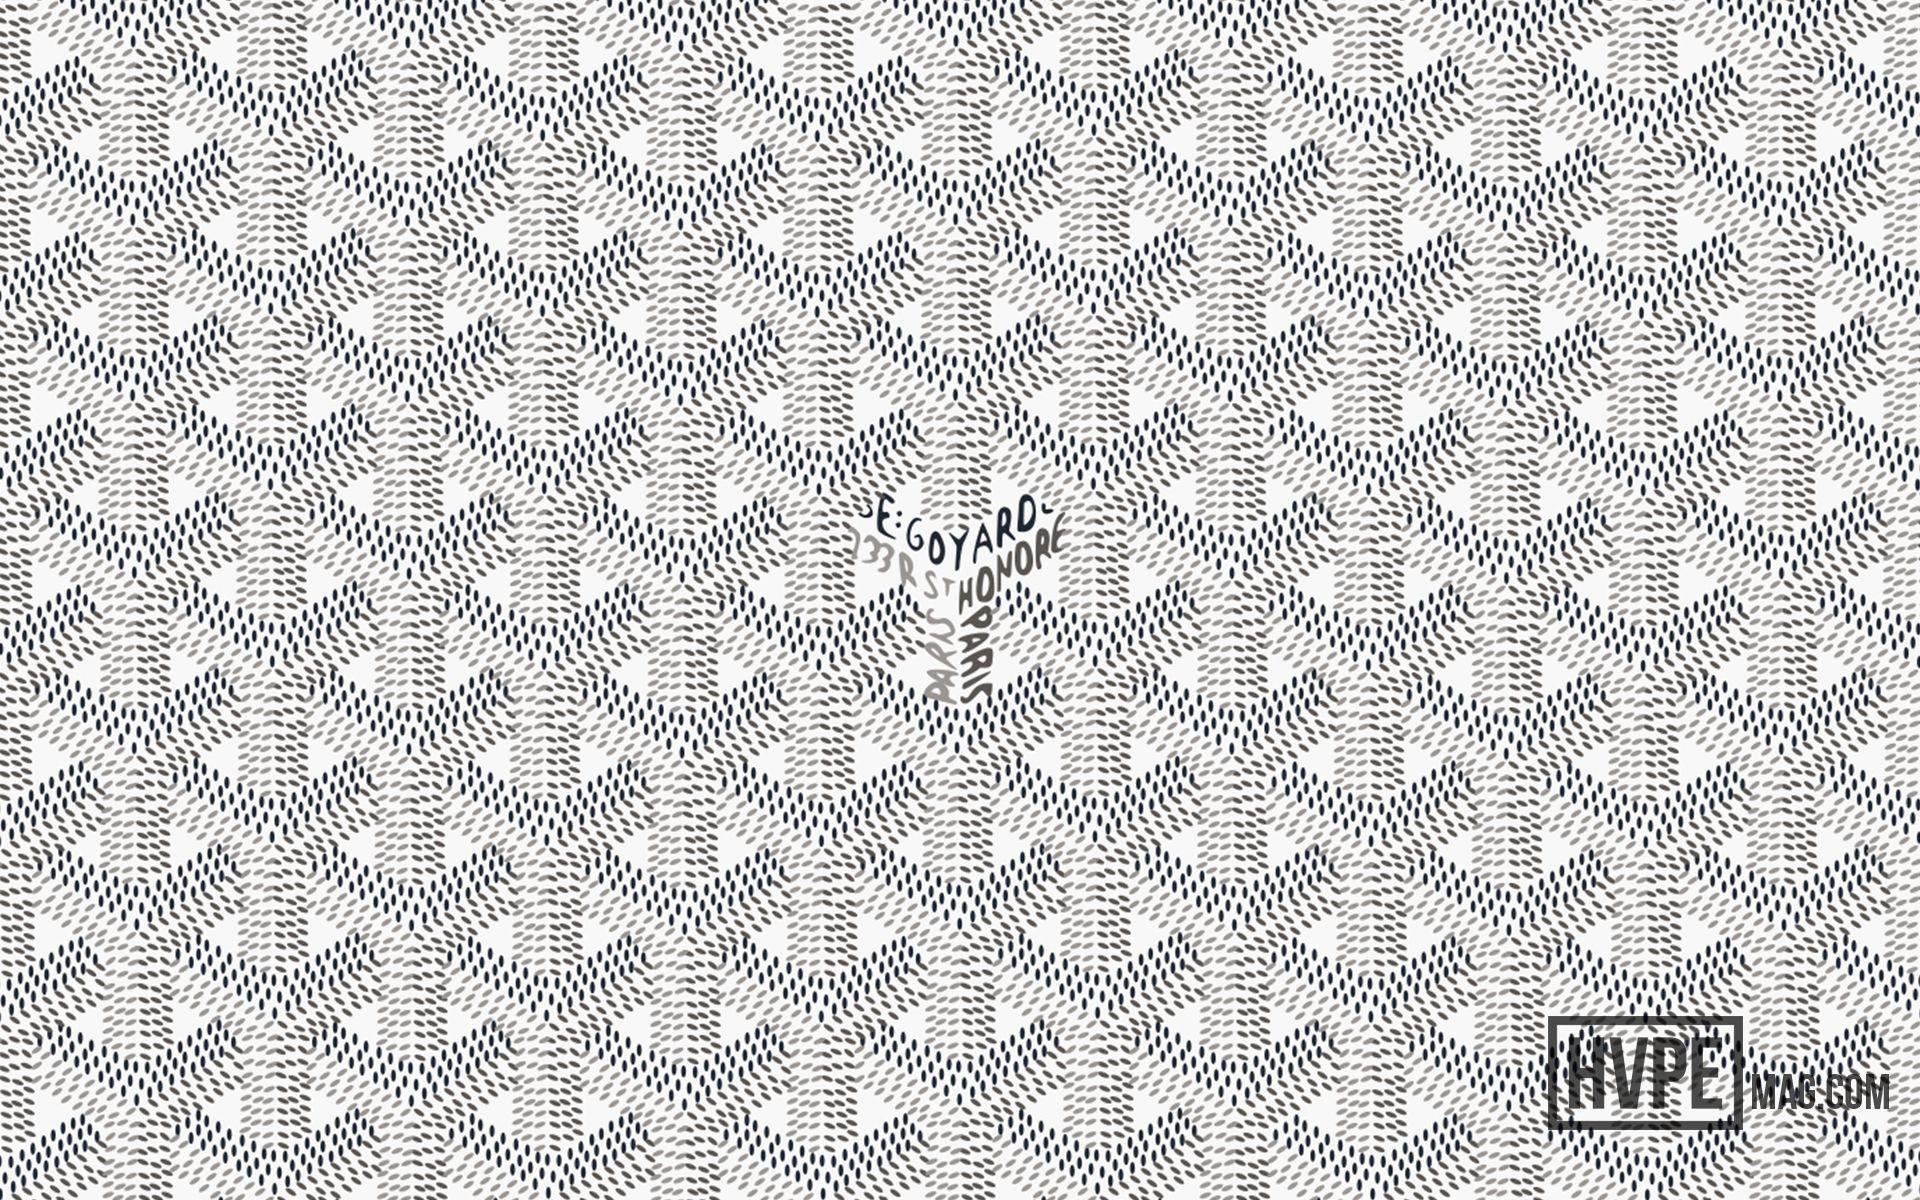 Goyard Wallpapers (48+ images)